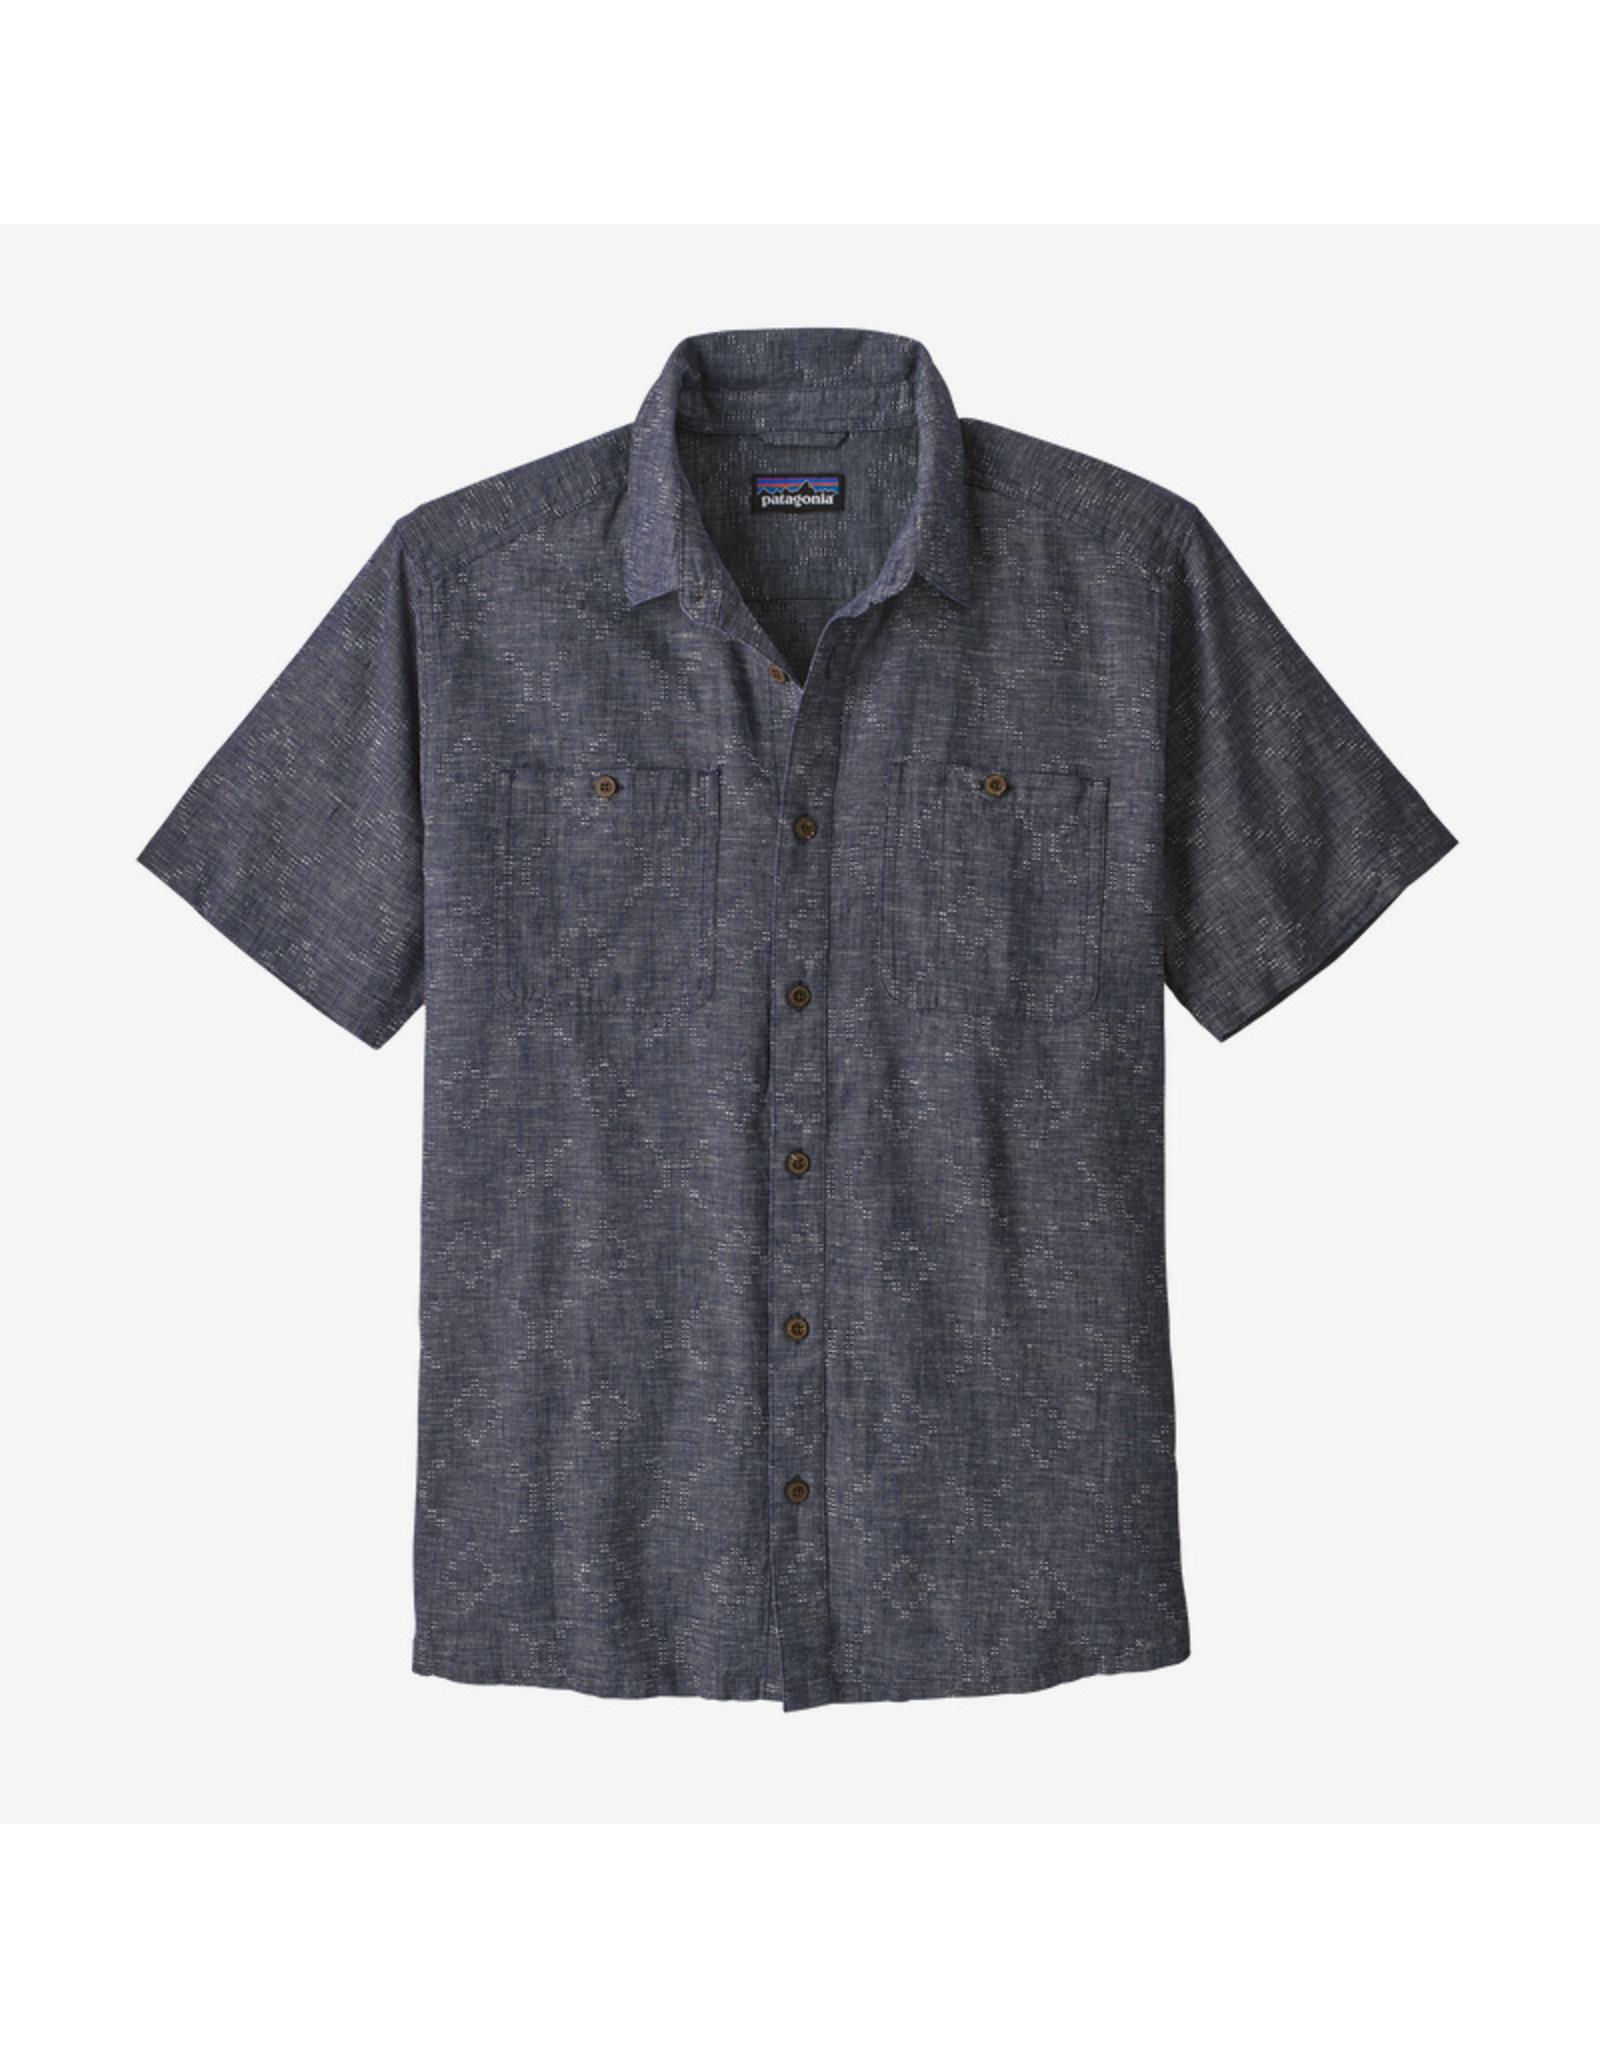 Patagonia Patagonia - M's Back Step Shirt